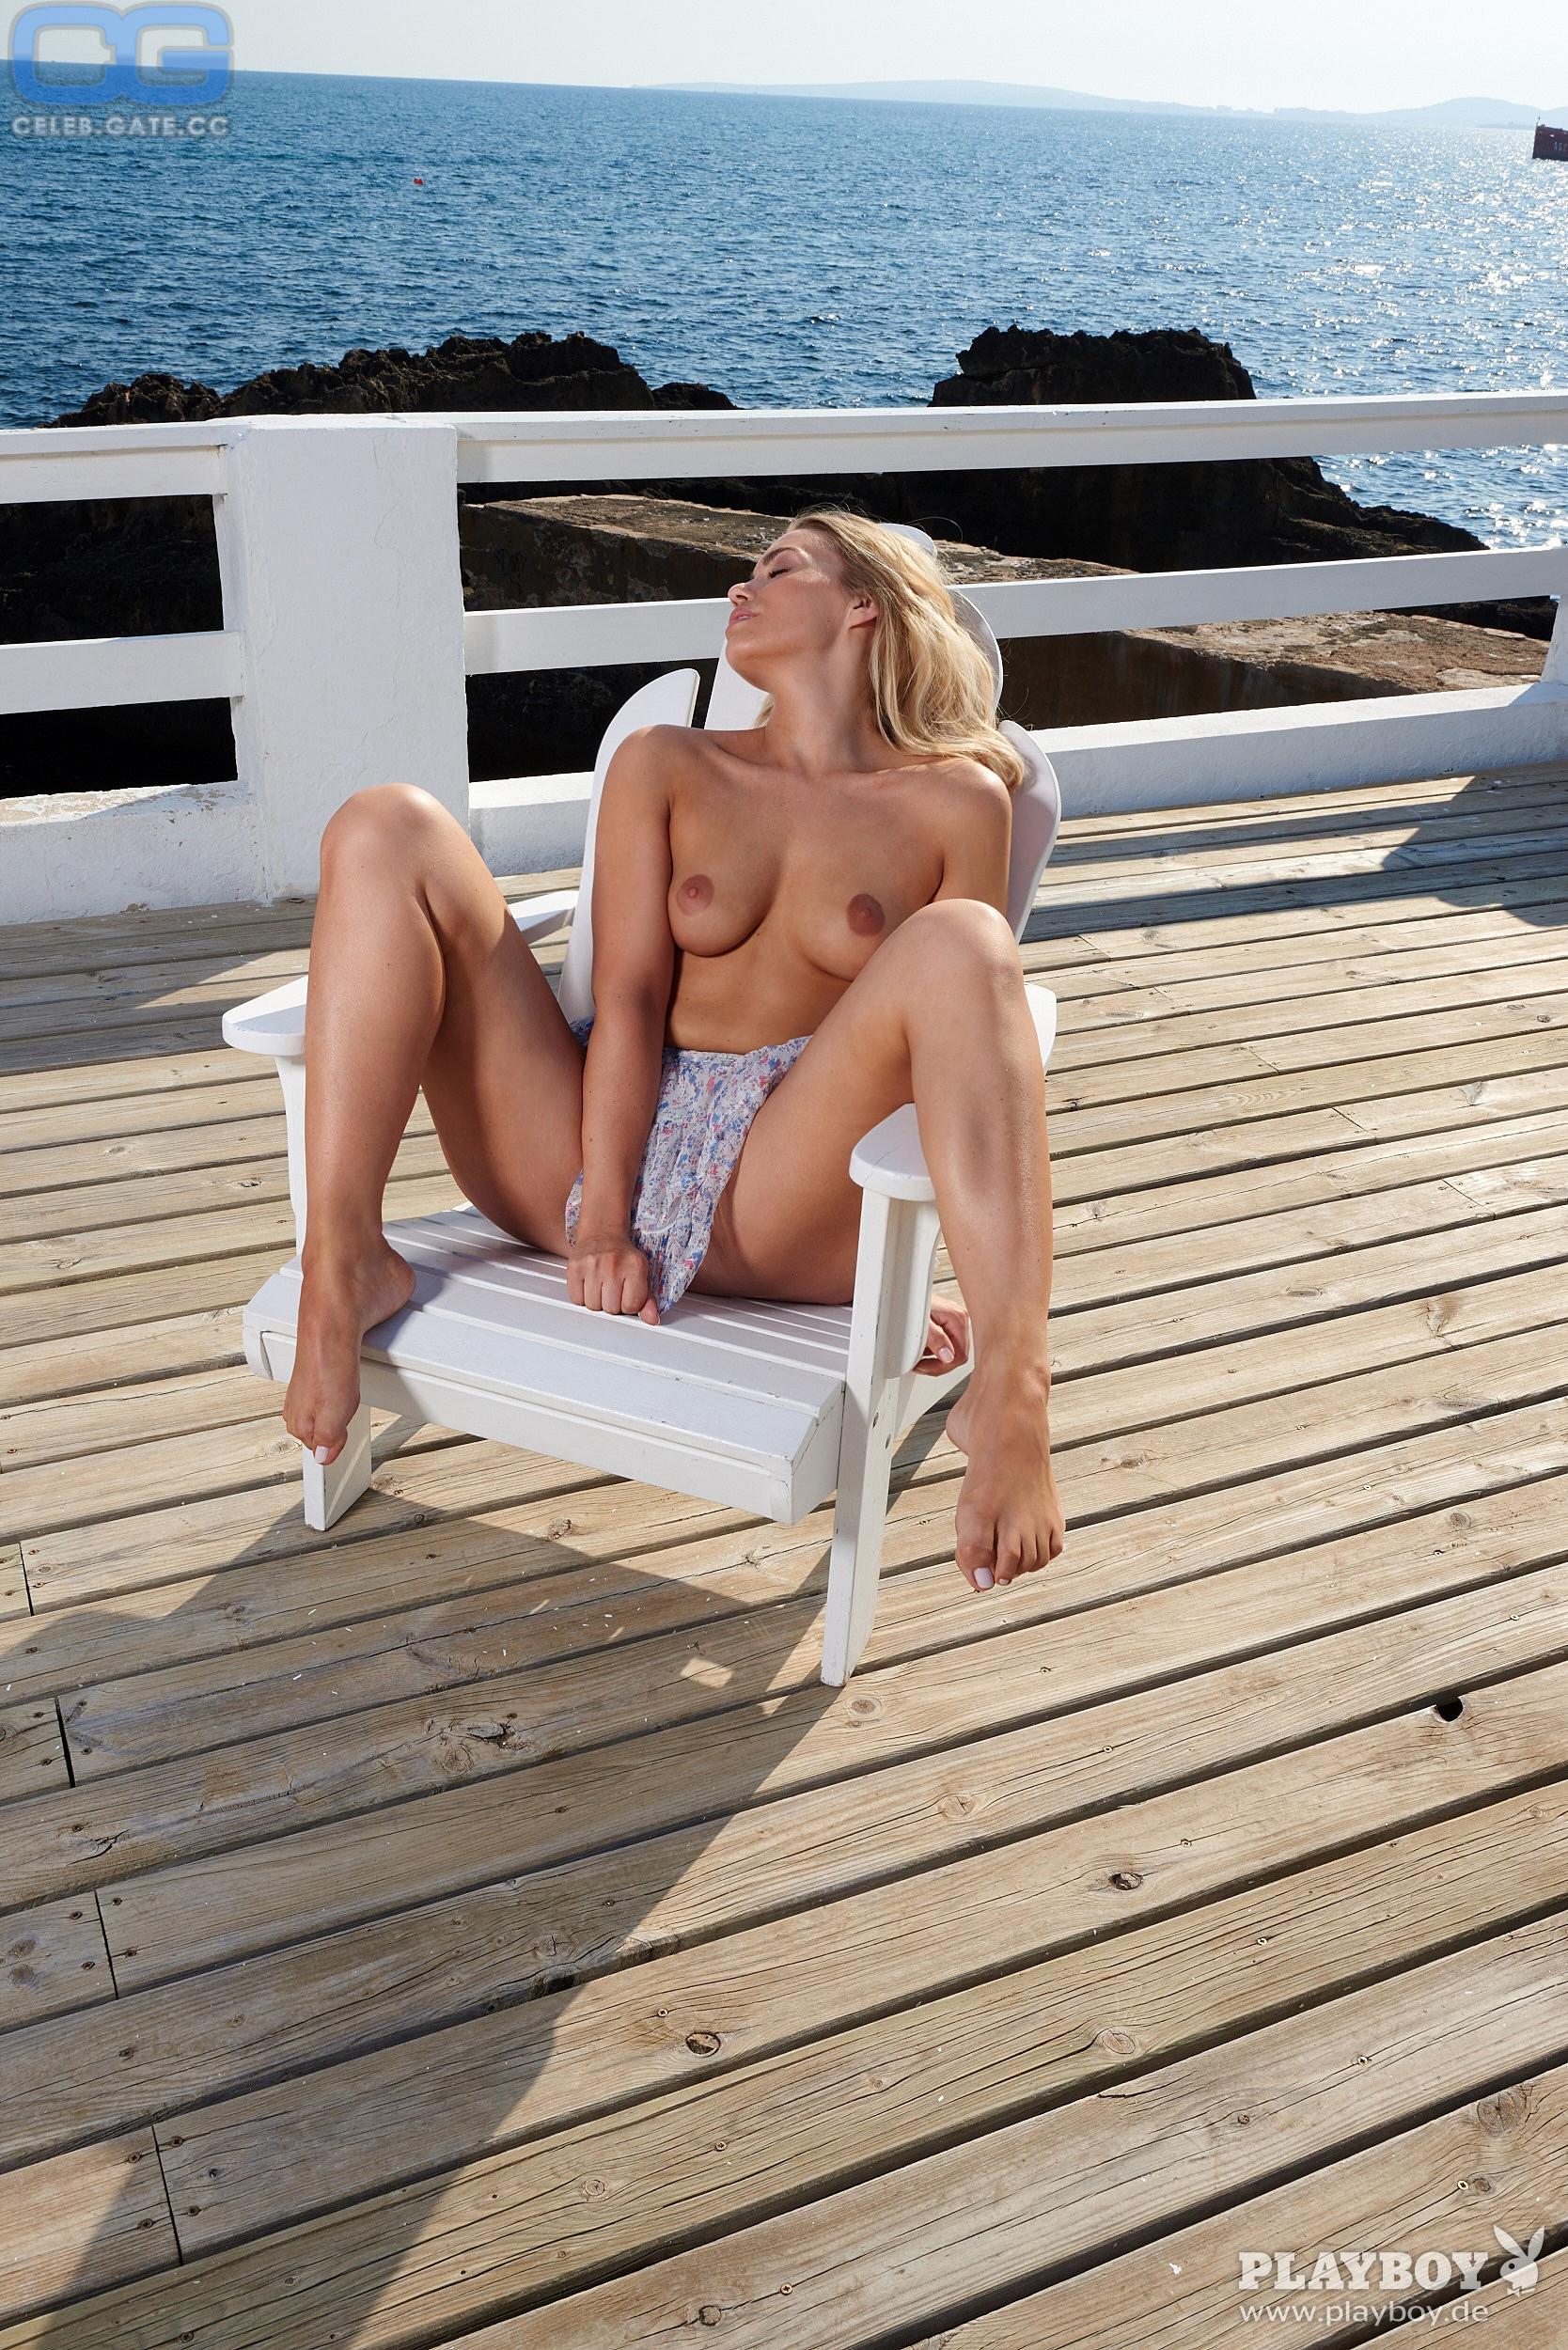 Lara isabelle rentinck nackt playboy